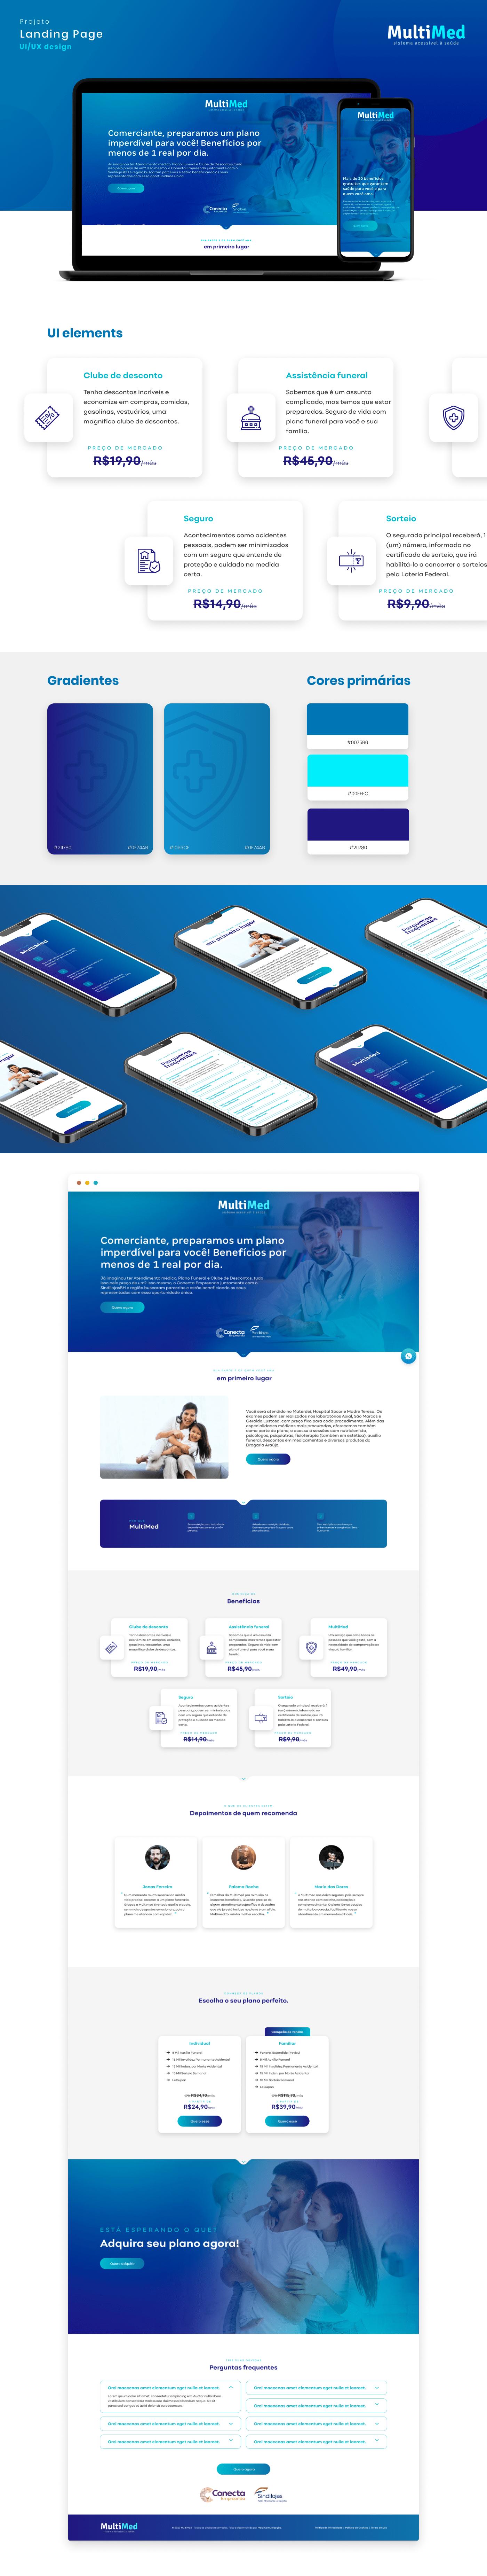 Figma Layout mobile site ui design UX design Web Website